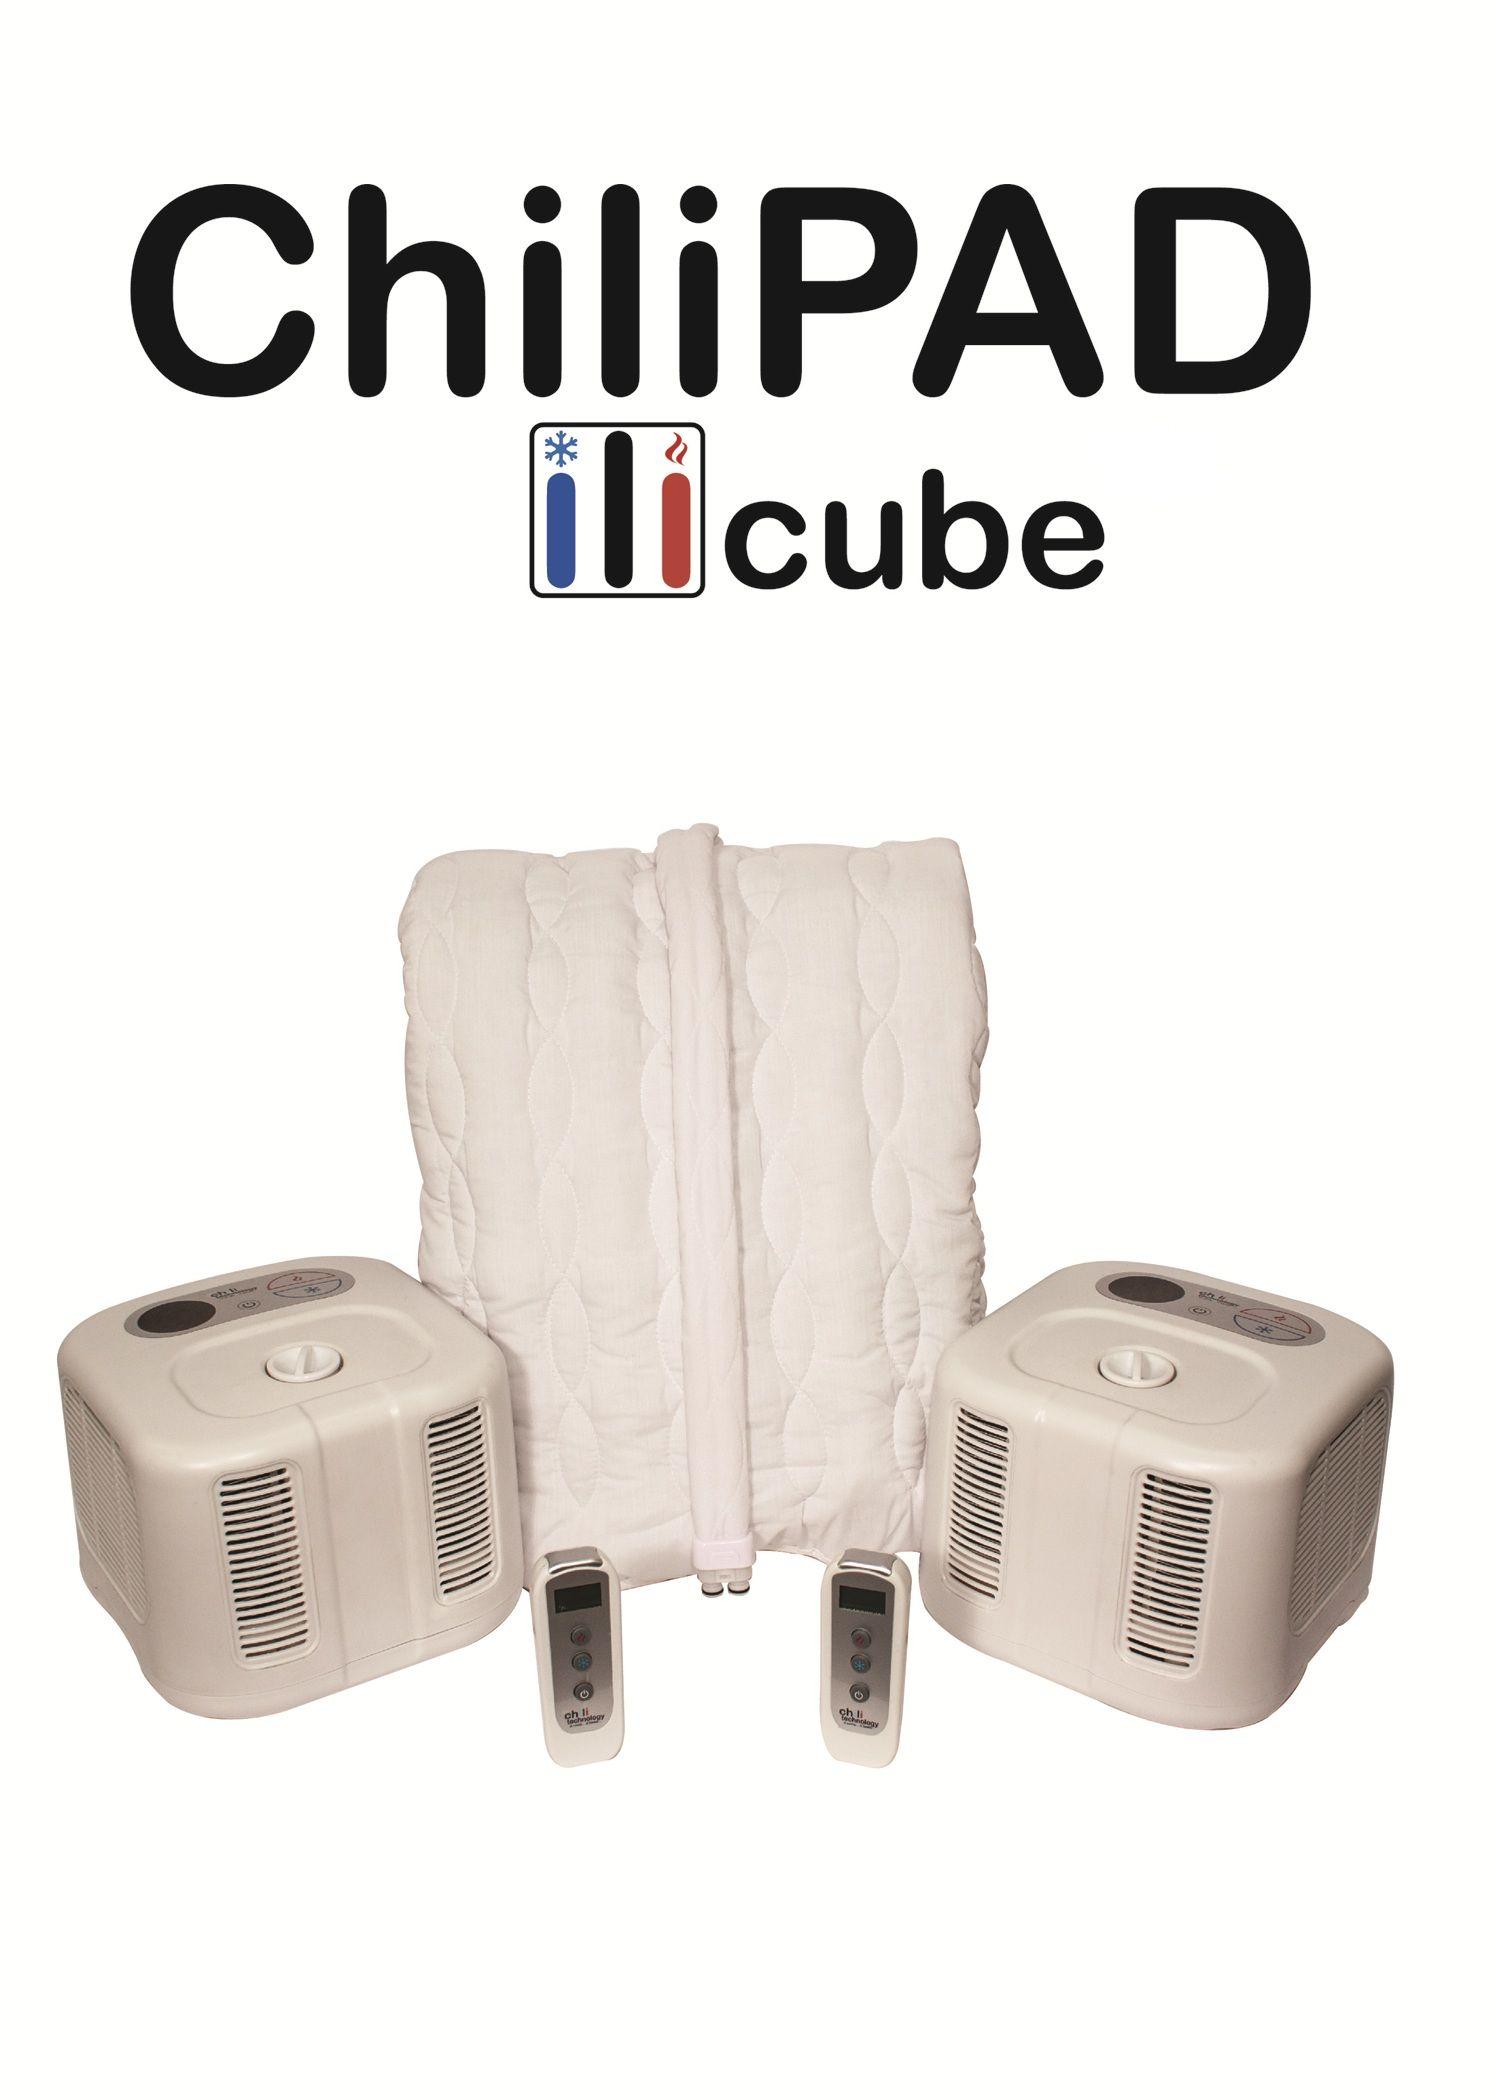 Chilipad Cube Dual Zone Temperature Control Cooling Mattress